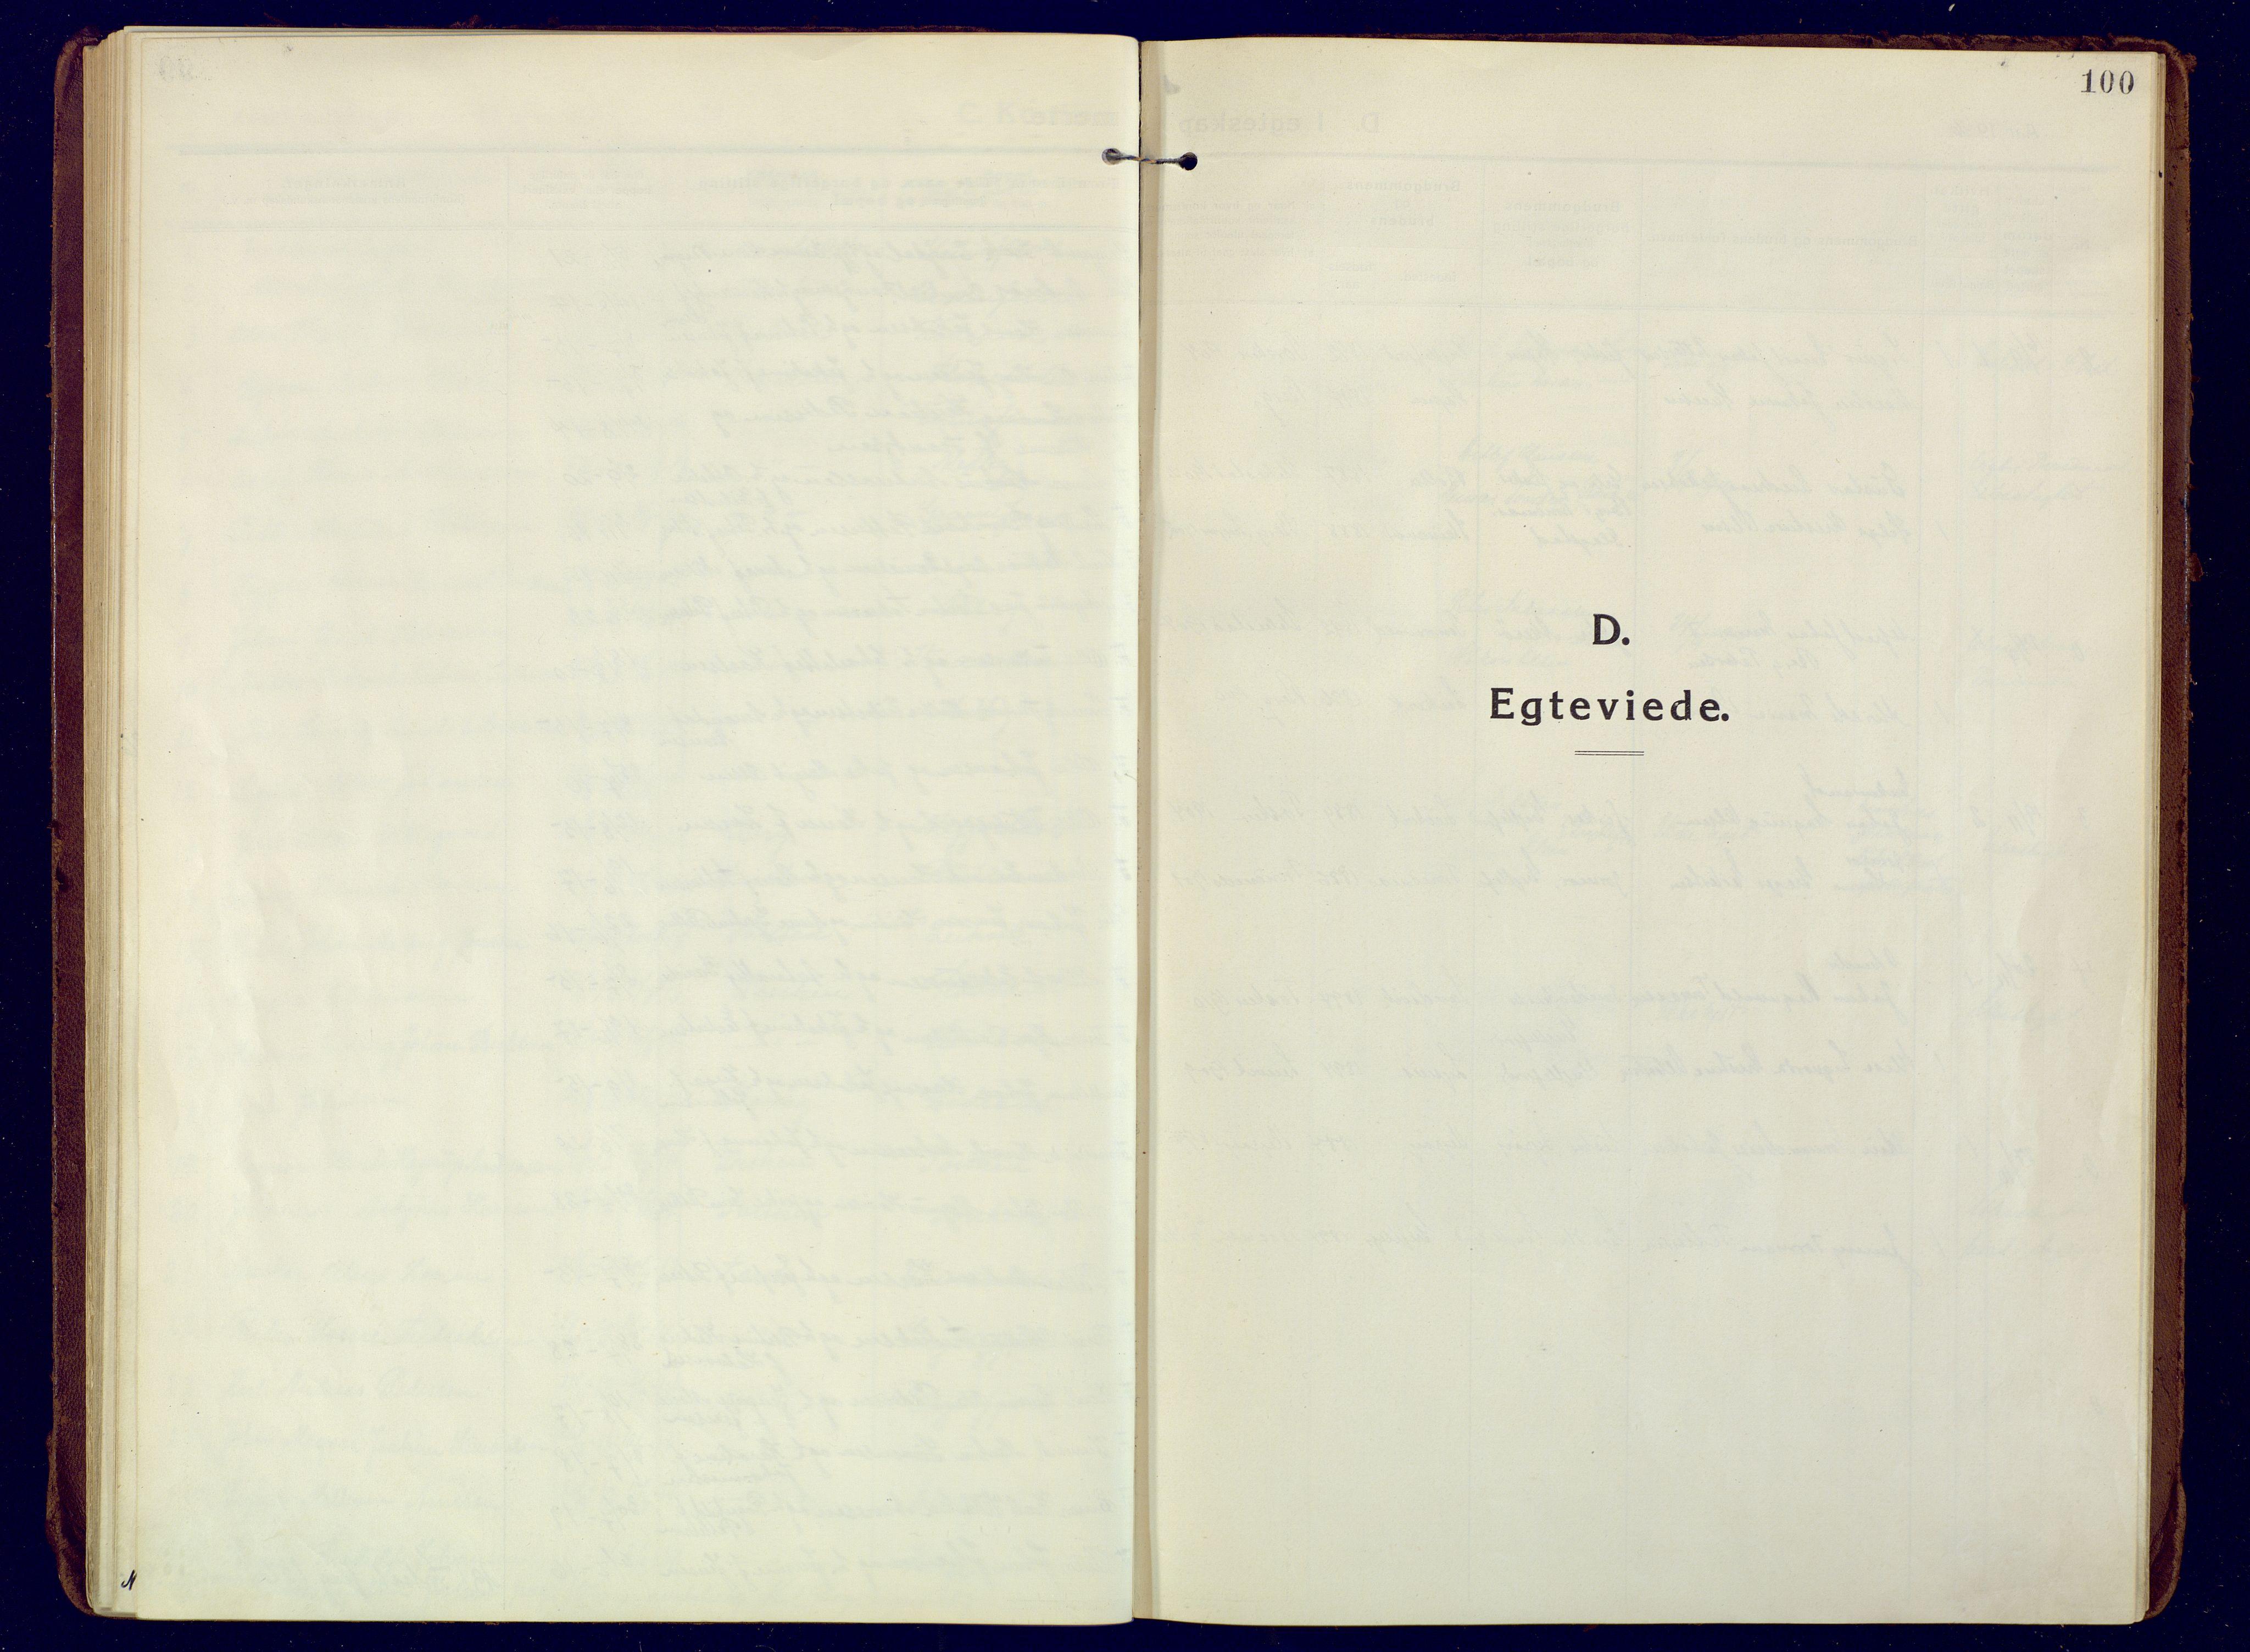 SATØ, Mefjord/Berg sokneprestkontor, G/Ga/Gaa: Ministerialbok nr. 10, 1916-1928, s. 100